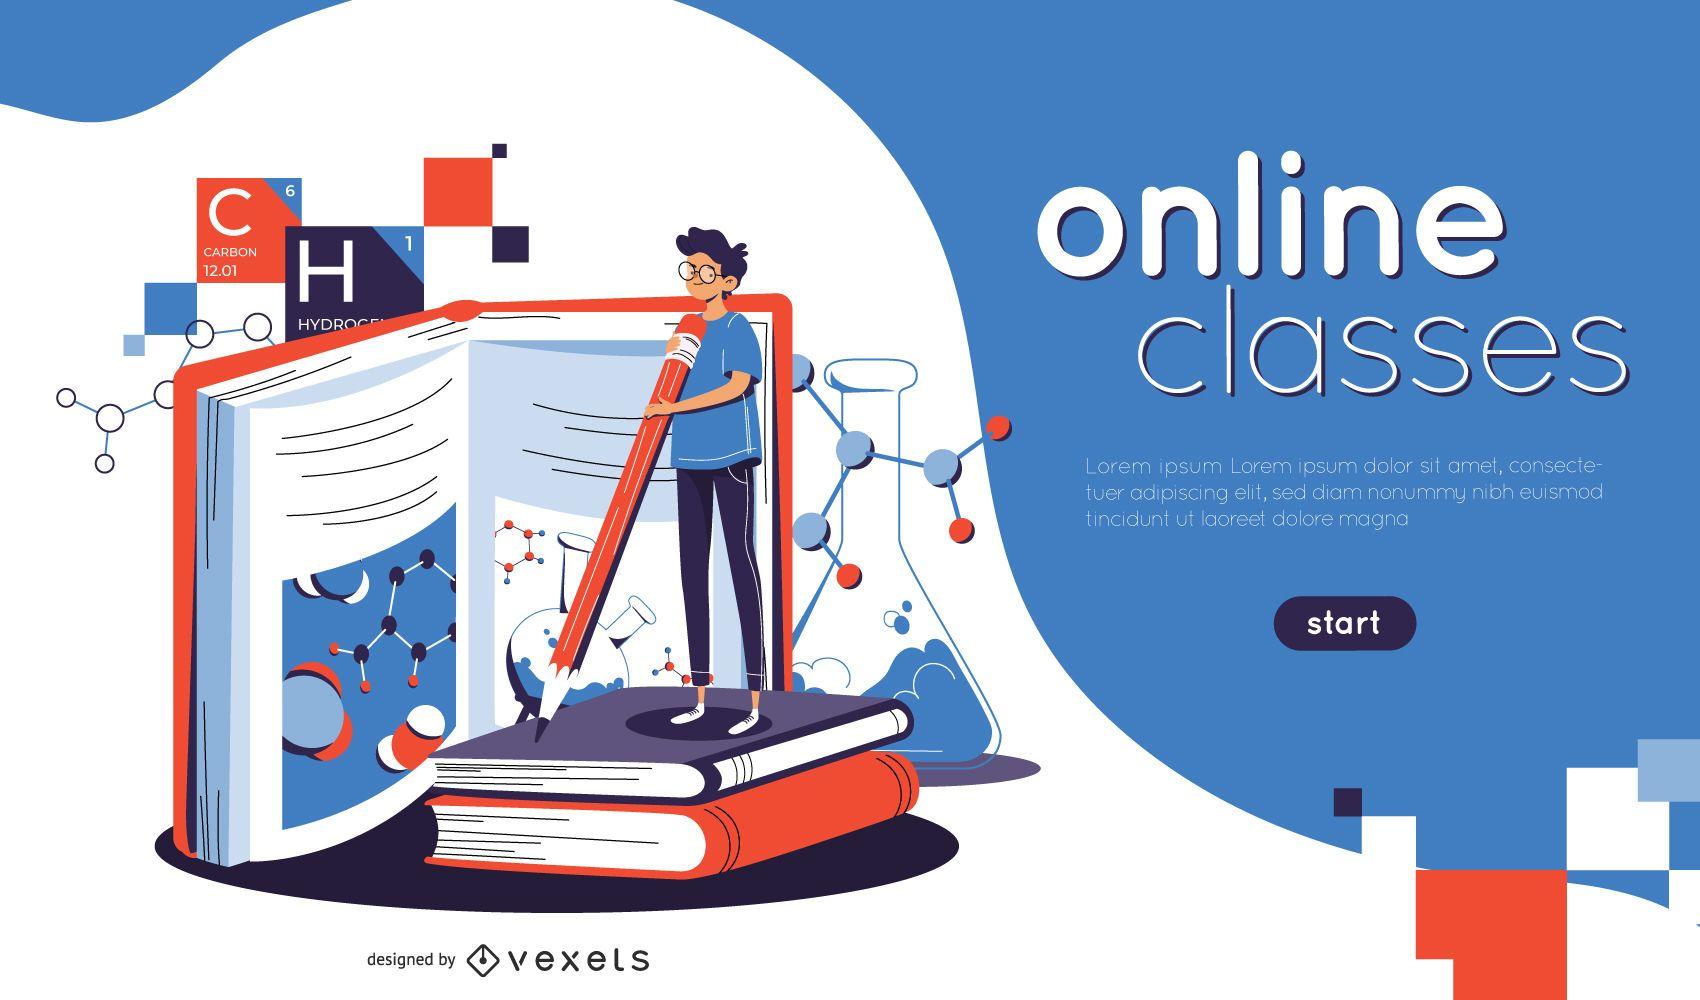 Control deslizante web de ilustraci?n de clases en l?nea